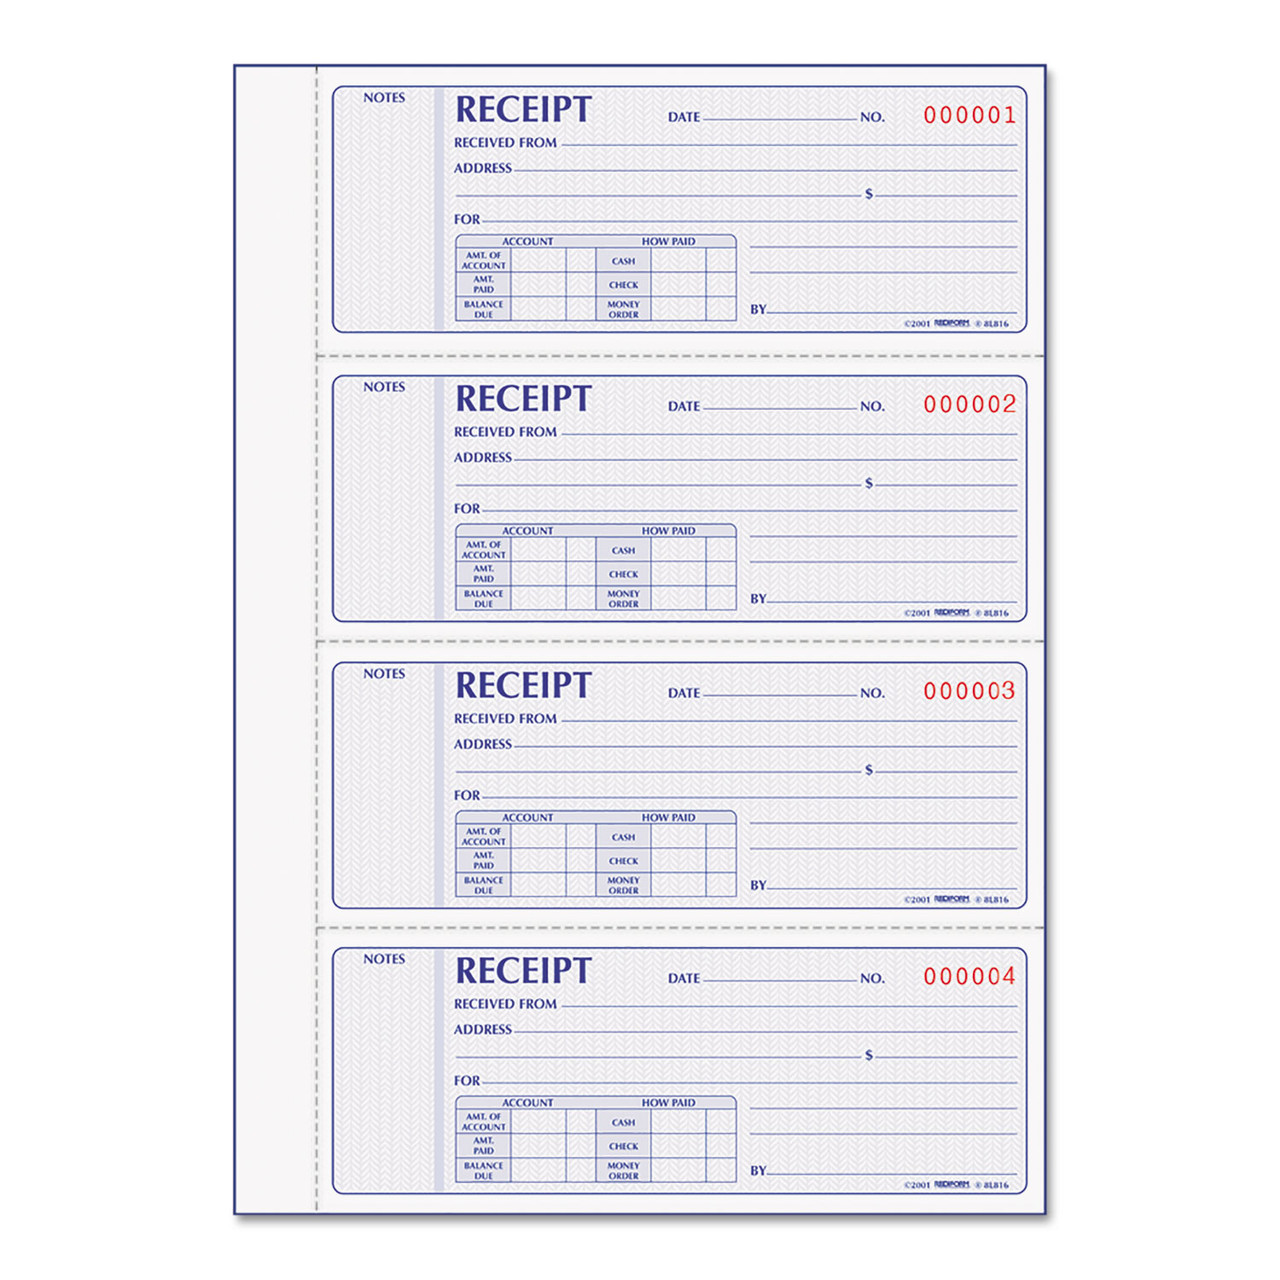 Rediform Small Money Receipt Book 50 Sets//Book Carbonless Duplicate 5 x 2-3//4